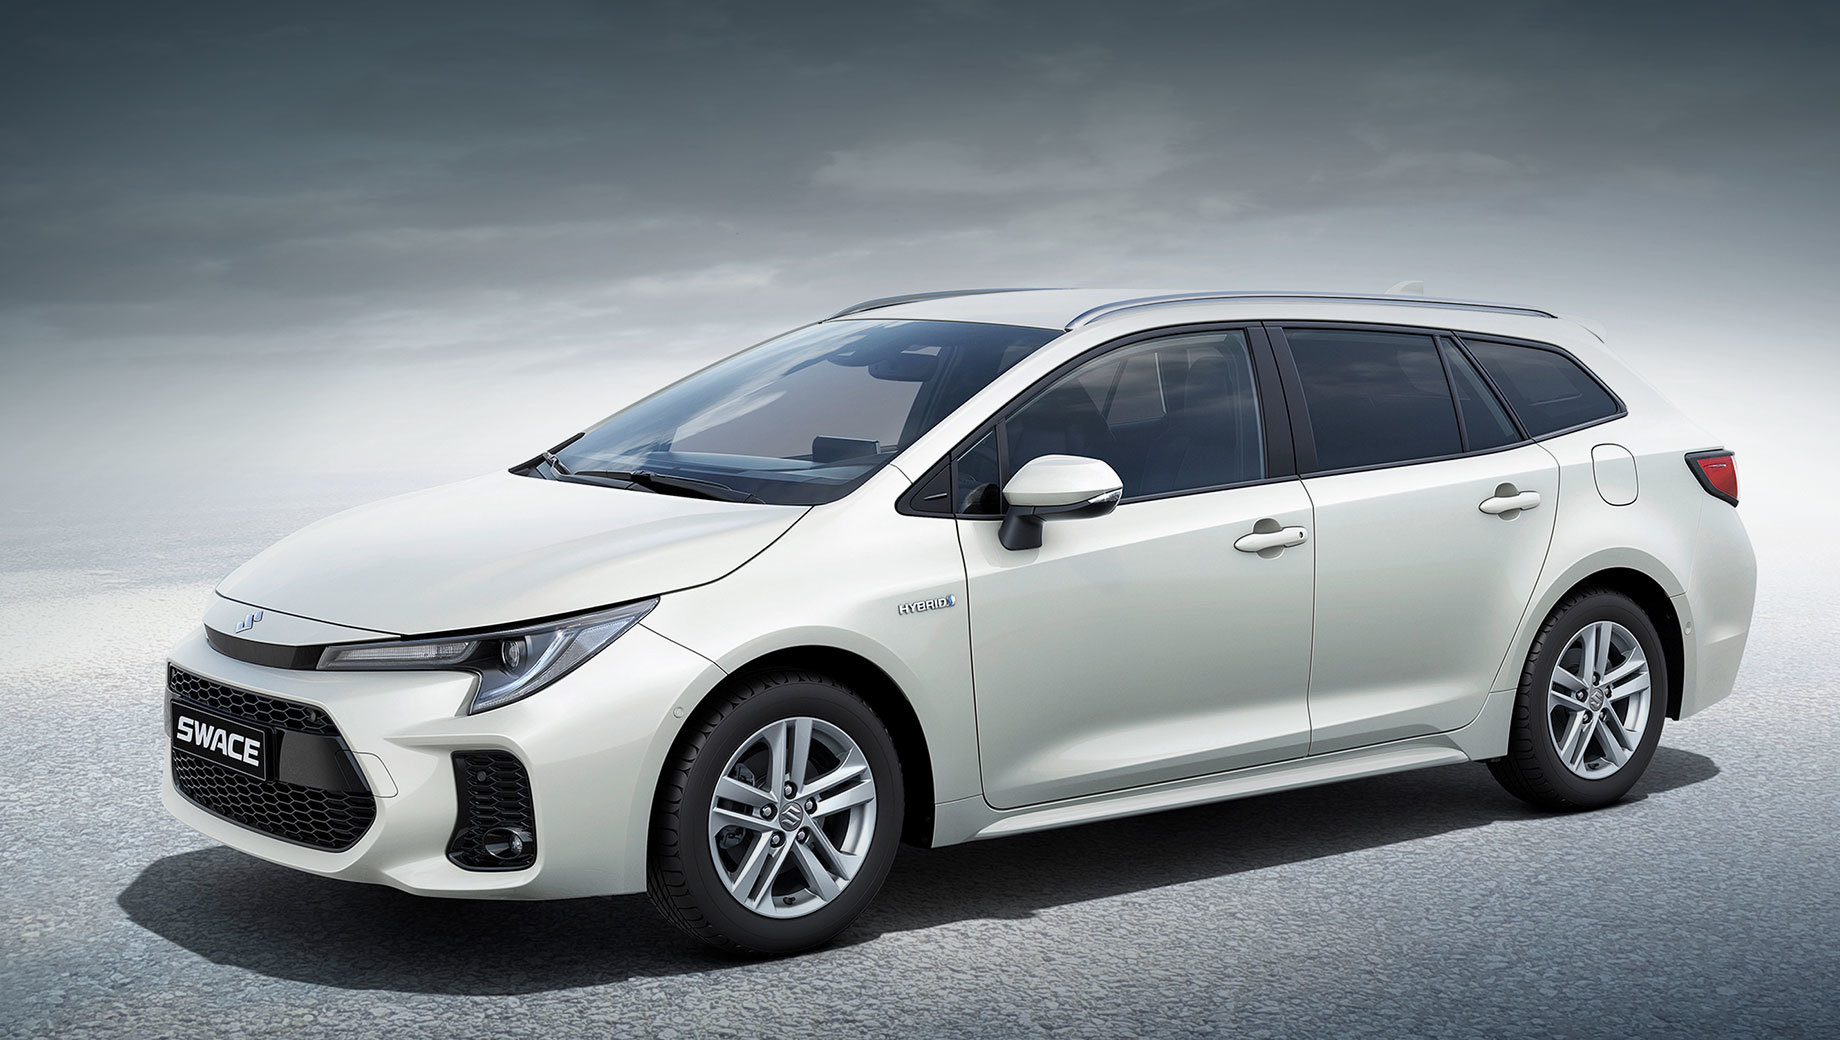 Гибрид Suzuki Swace повторил универсал Toyota Corolla